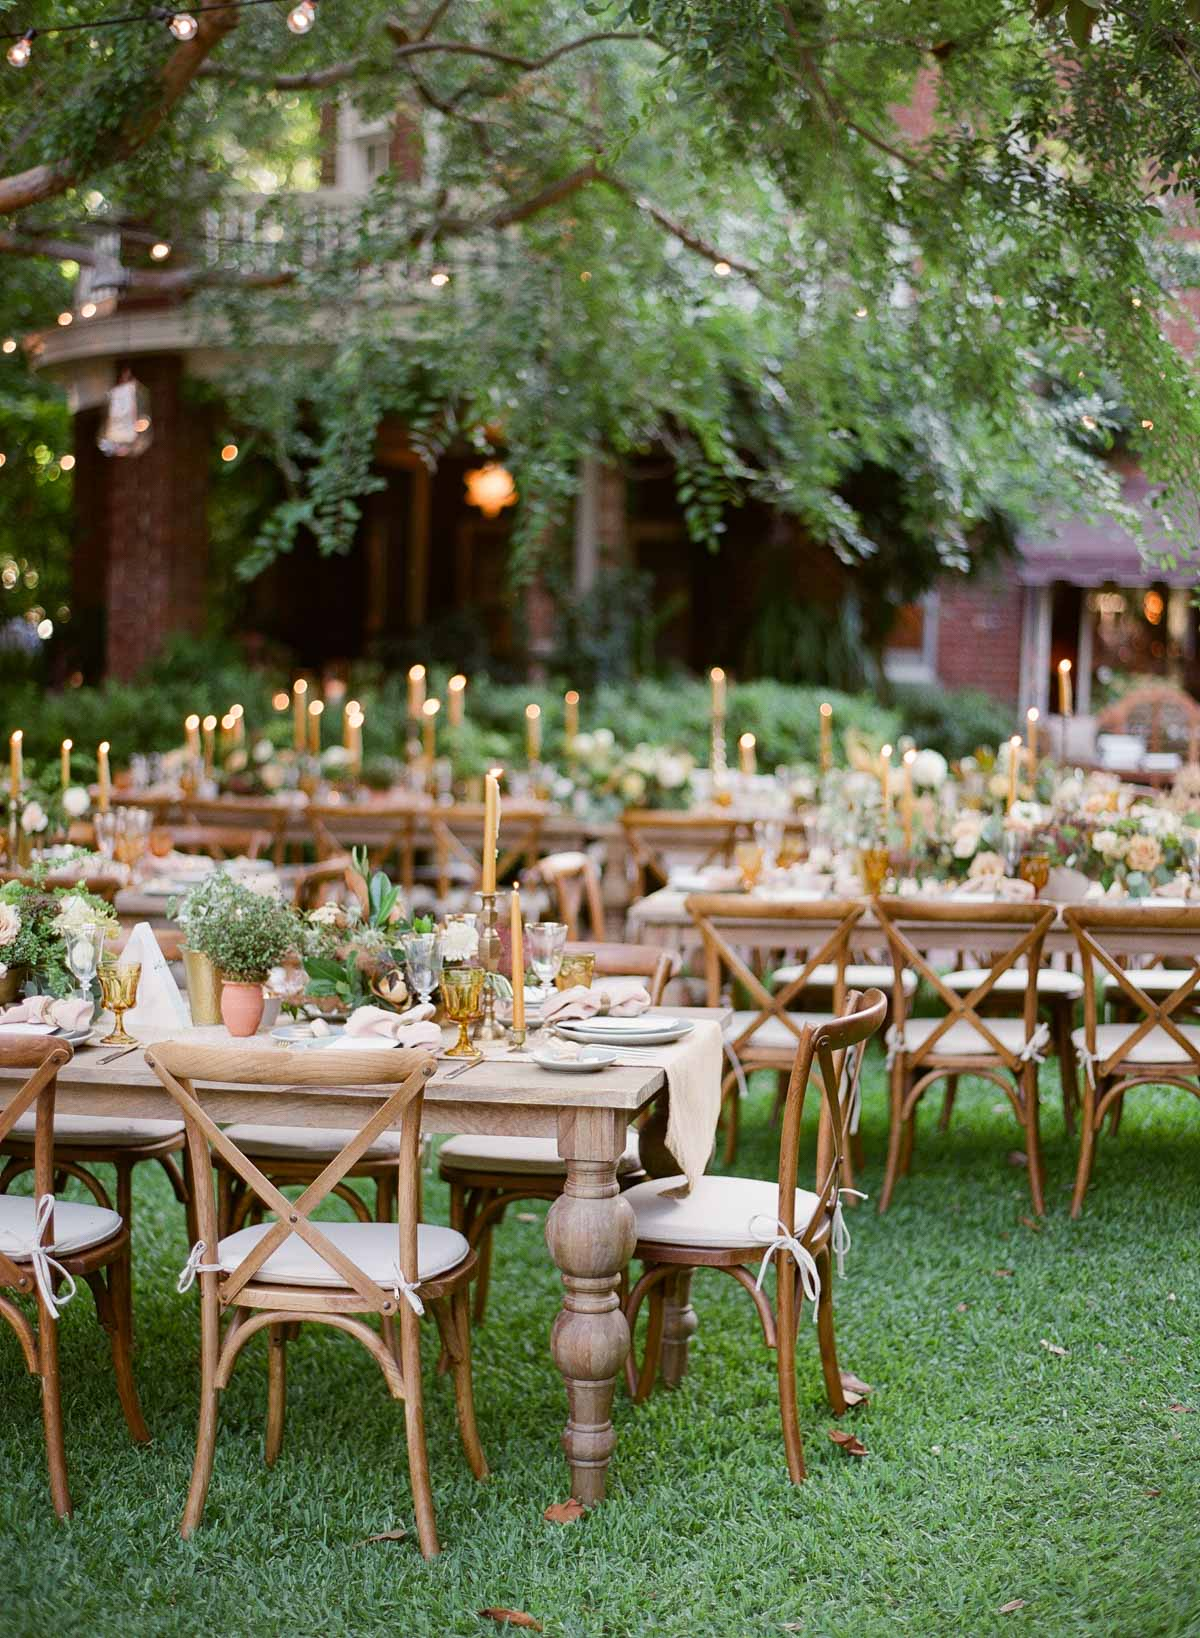 Lauren_Travis_Backyard_California_Wedding (c) Greg_Finck-117.jpg